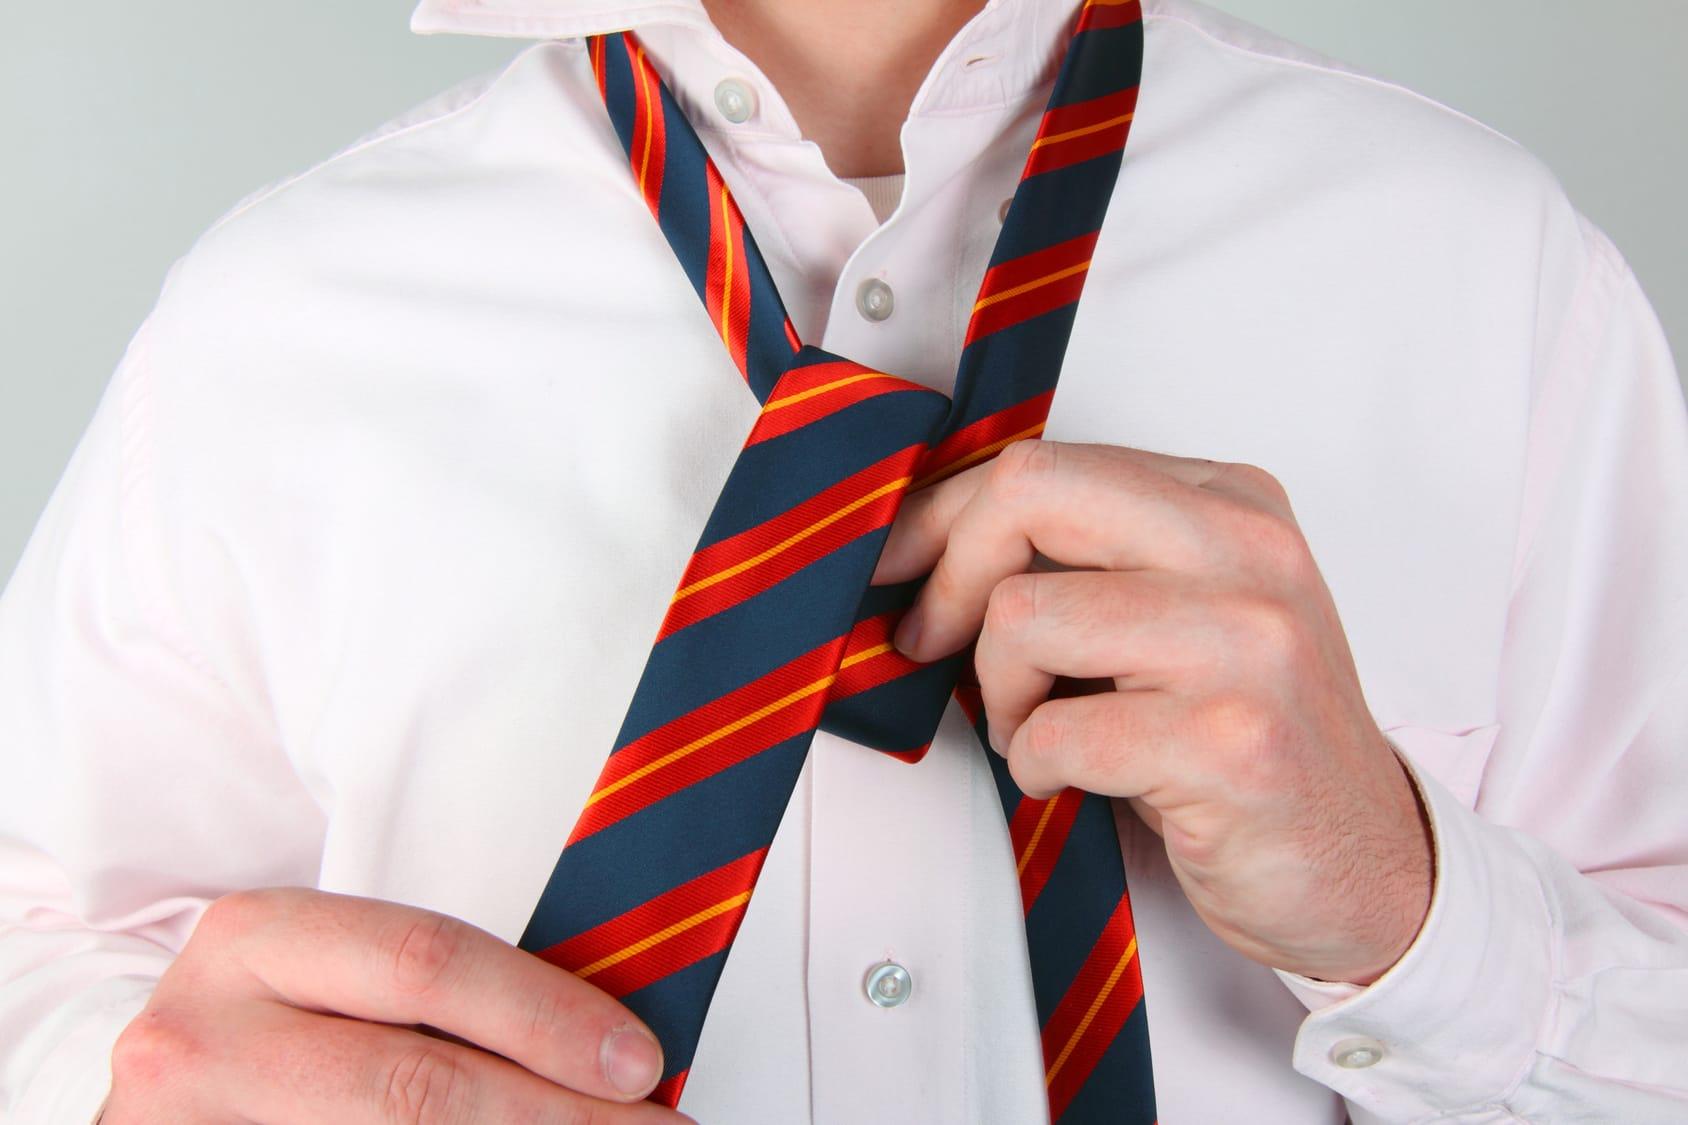 Krawattenknoten binden – So geht's!